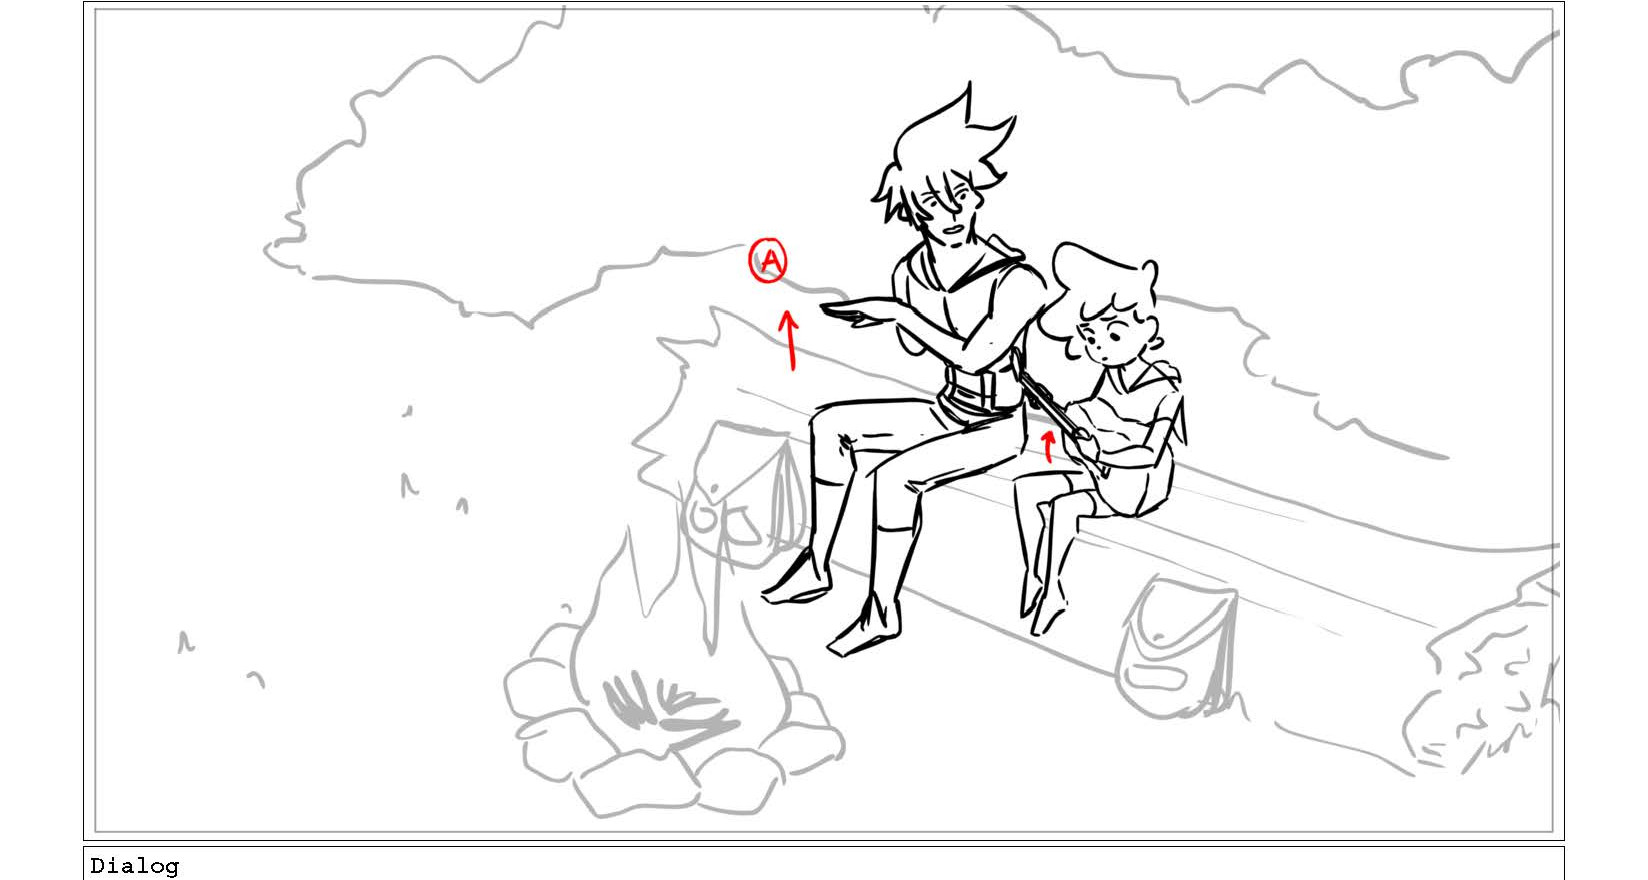 LM_Campfire_YouaremySunshine_1pnl_Page_2